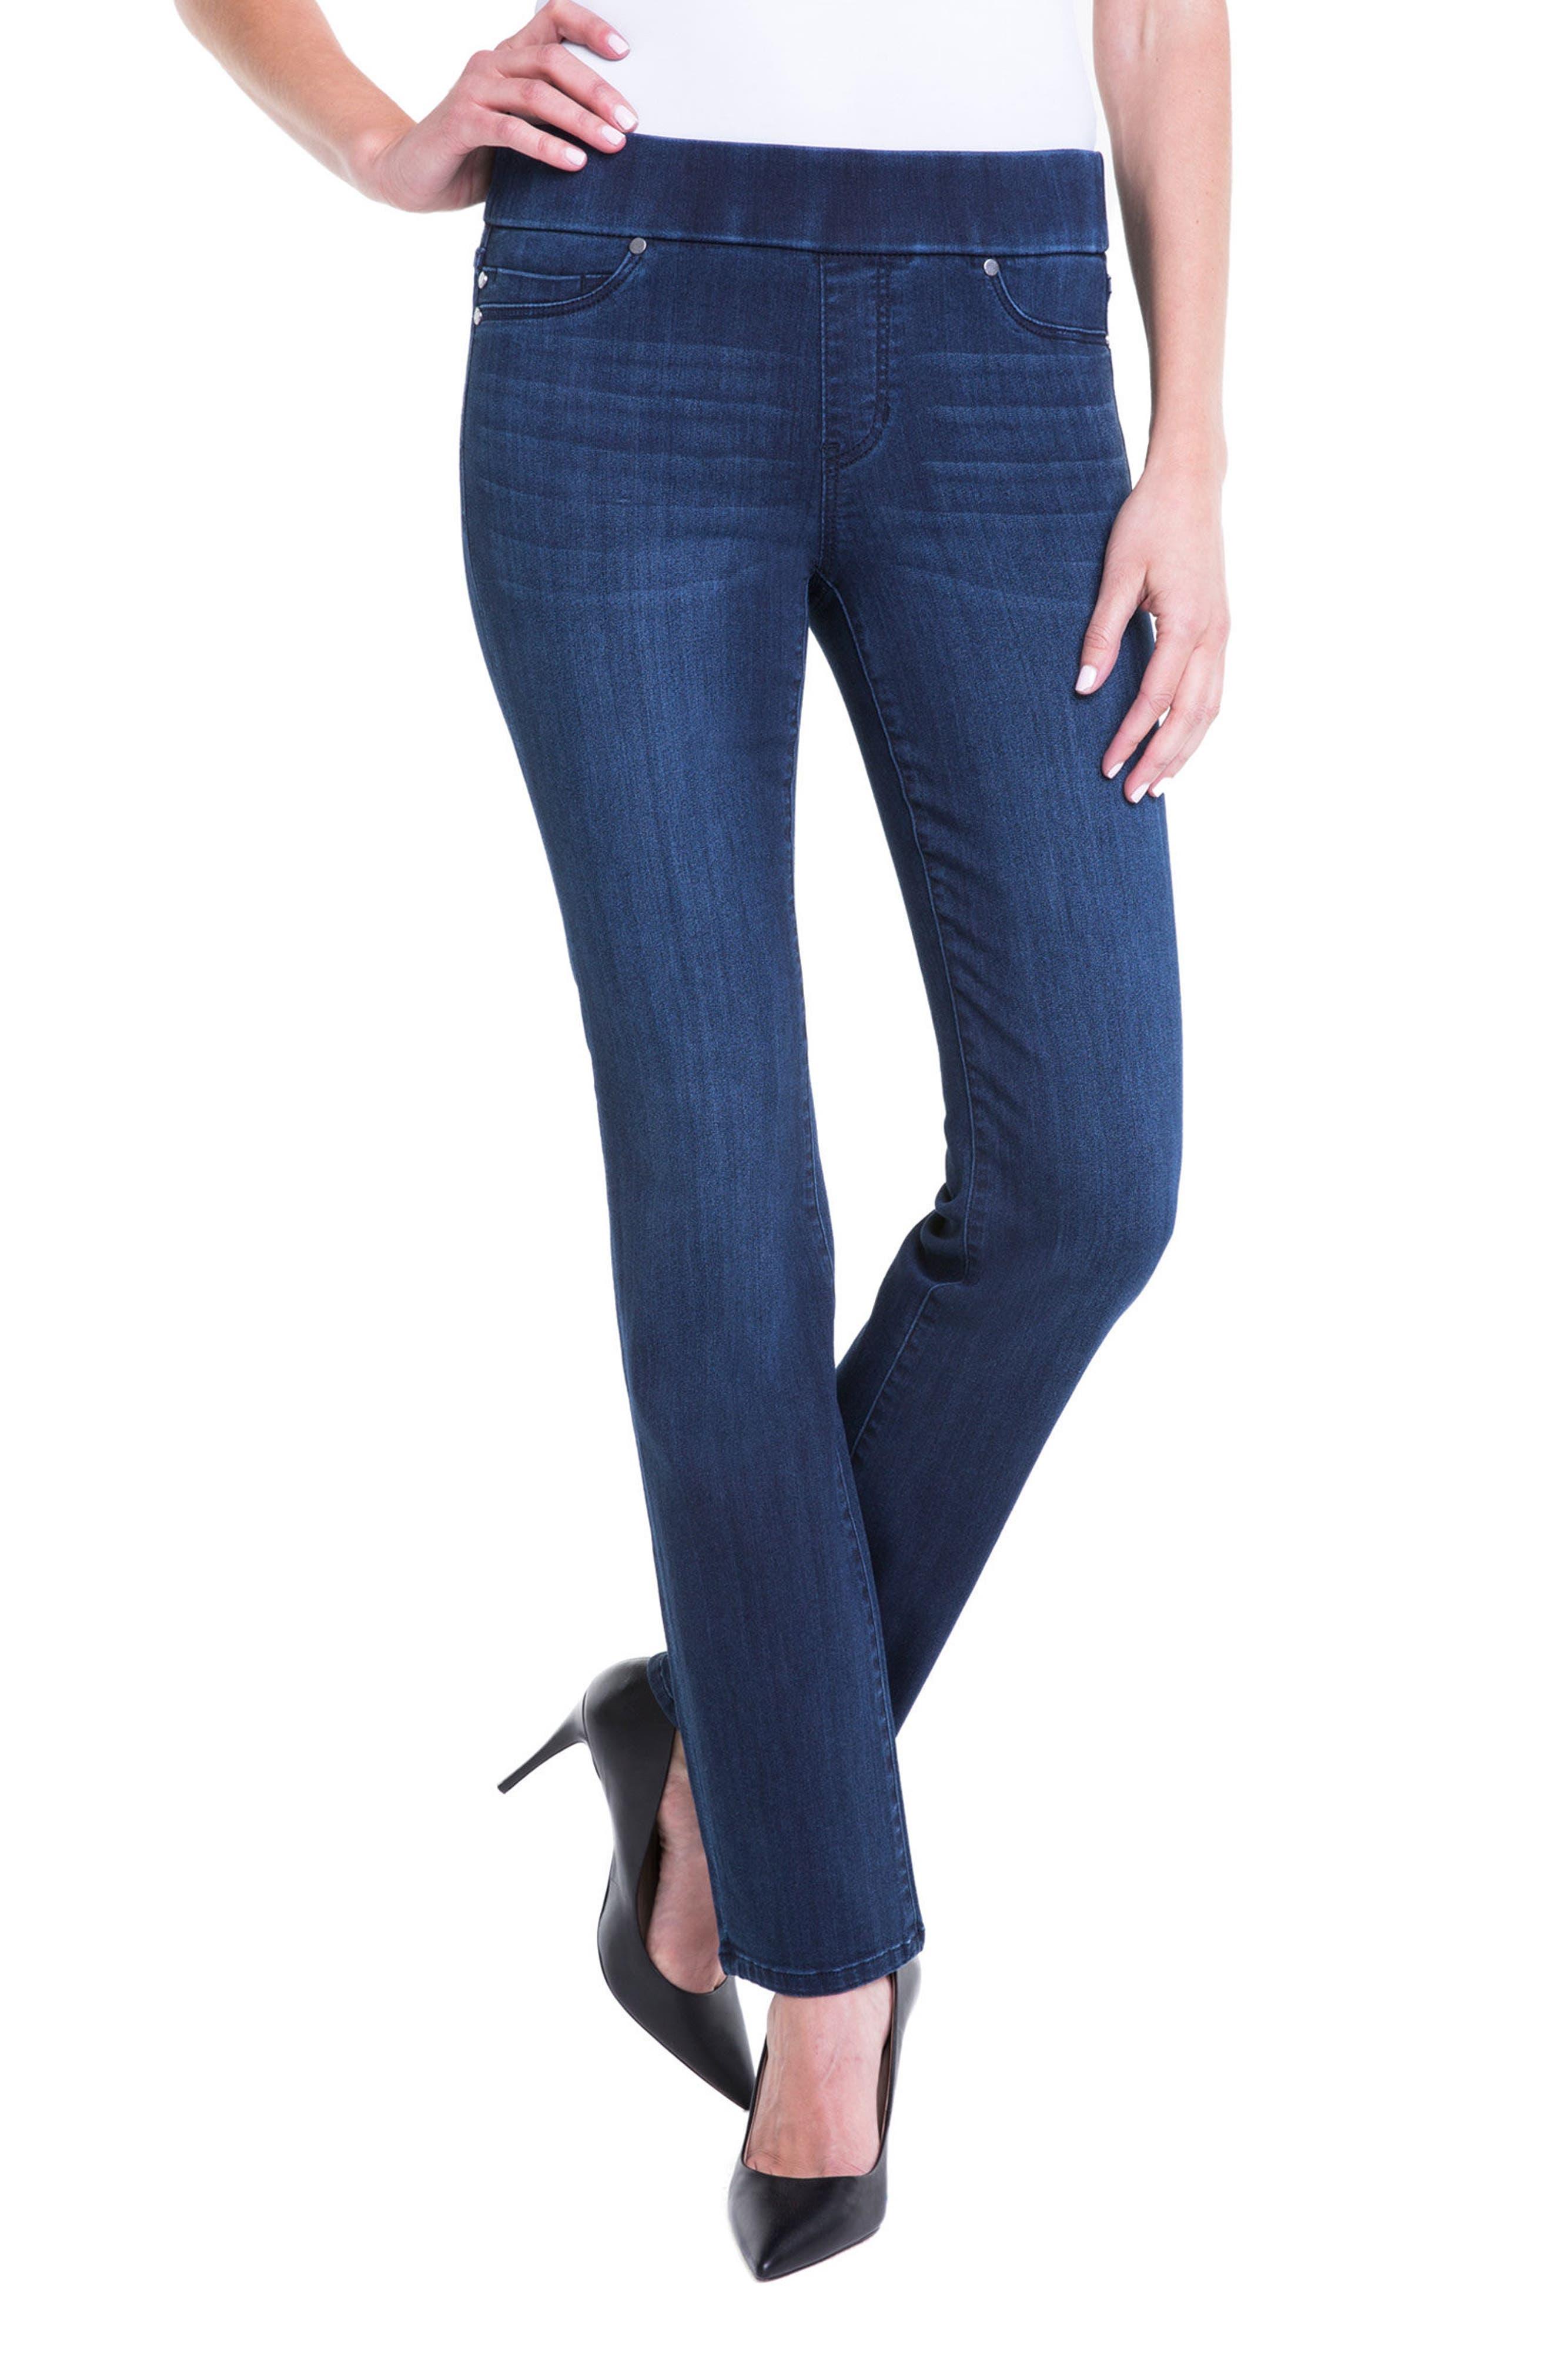 LIVERPOOL JEANS COMPANY Jillian Pull-On Straight Leg Jeans